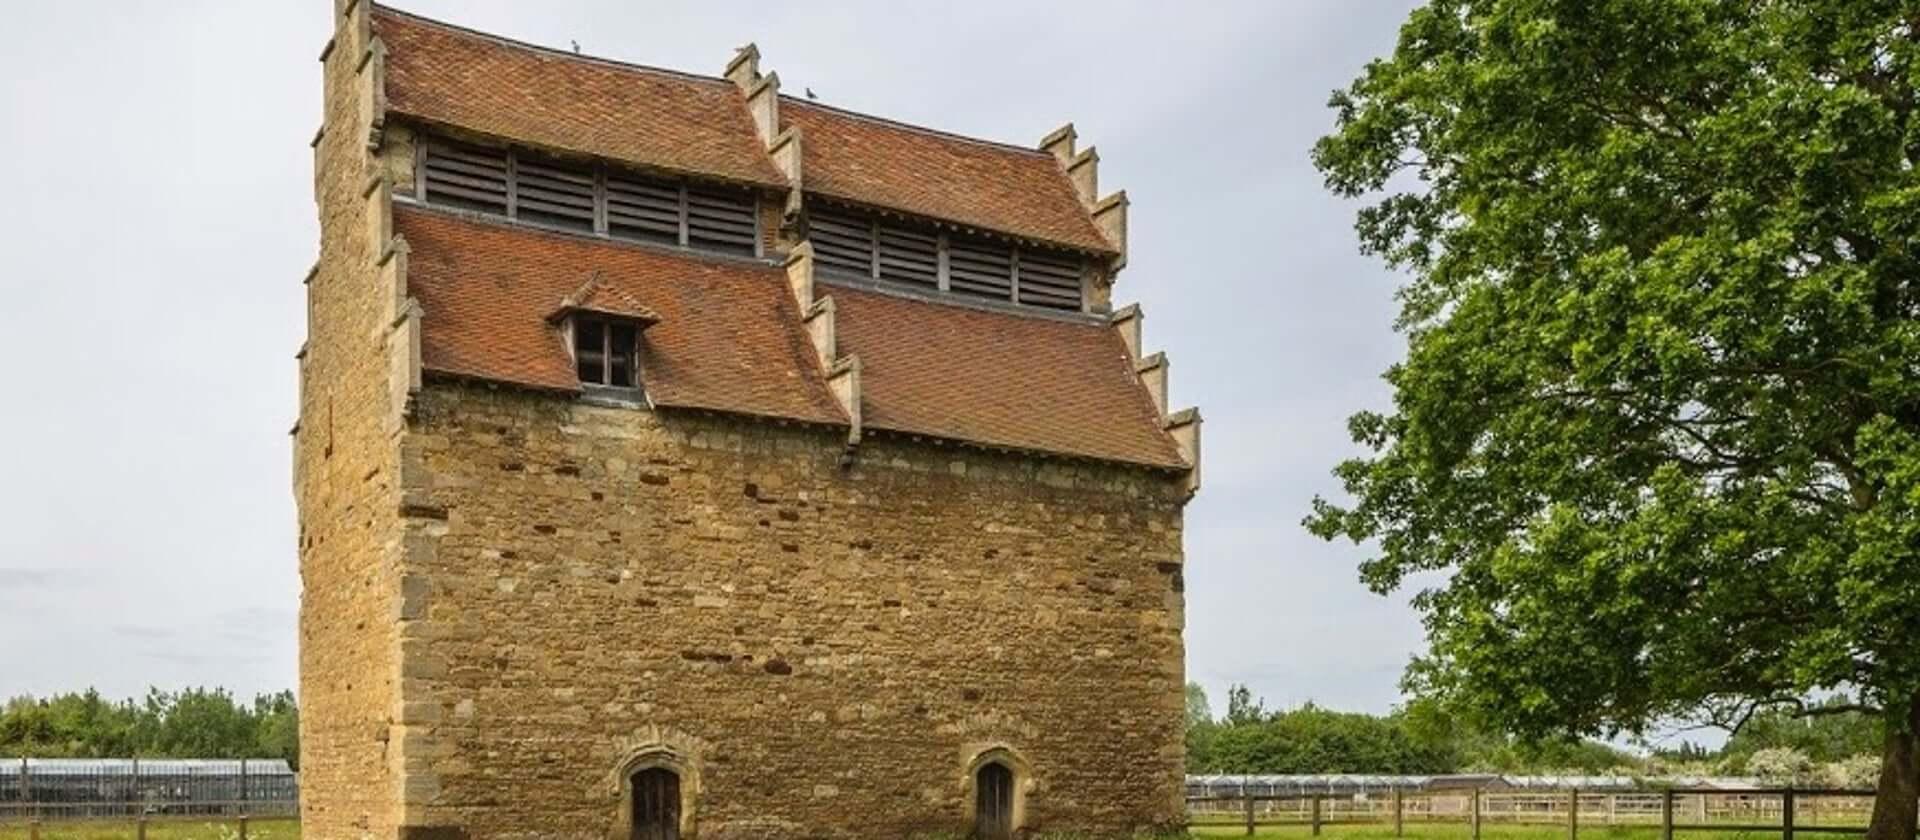 The exterior of the Willington Dovecote.